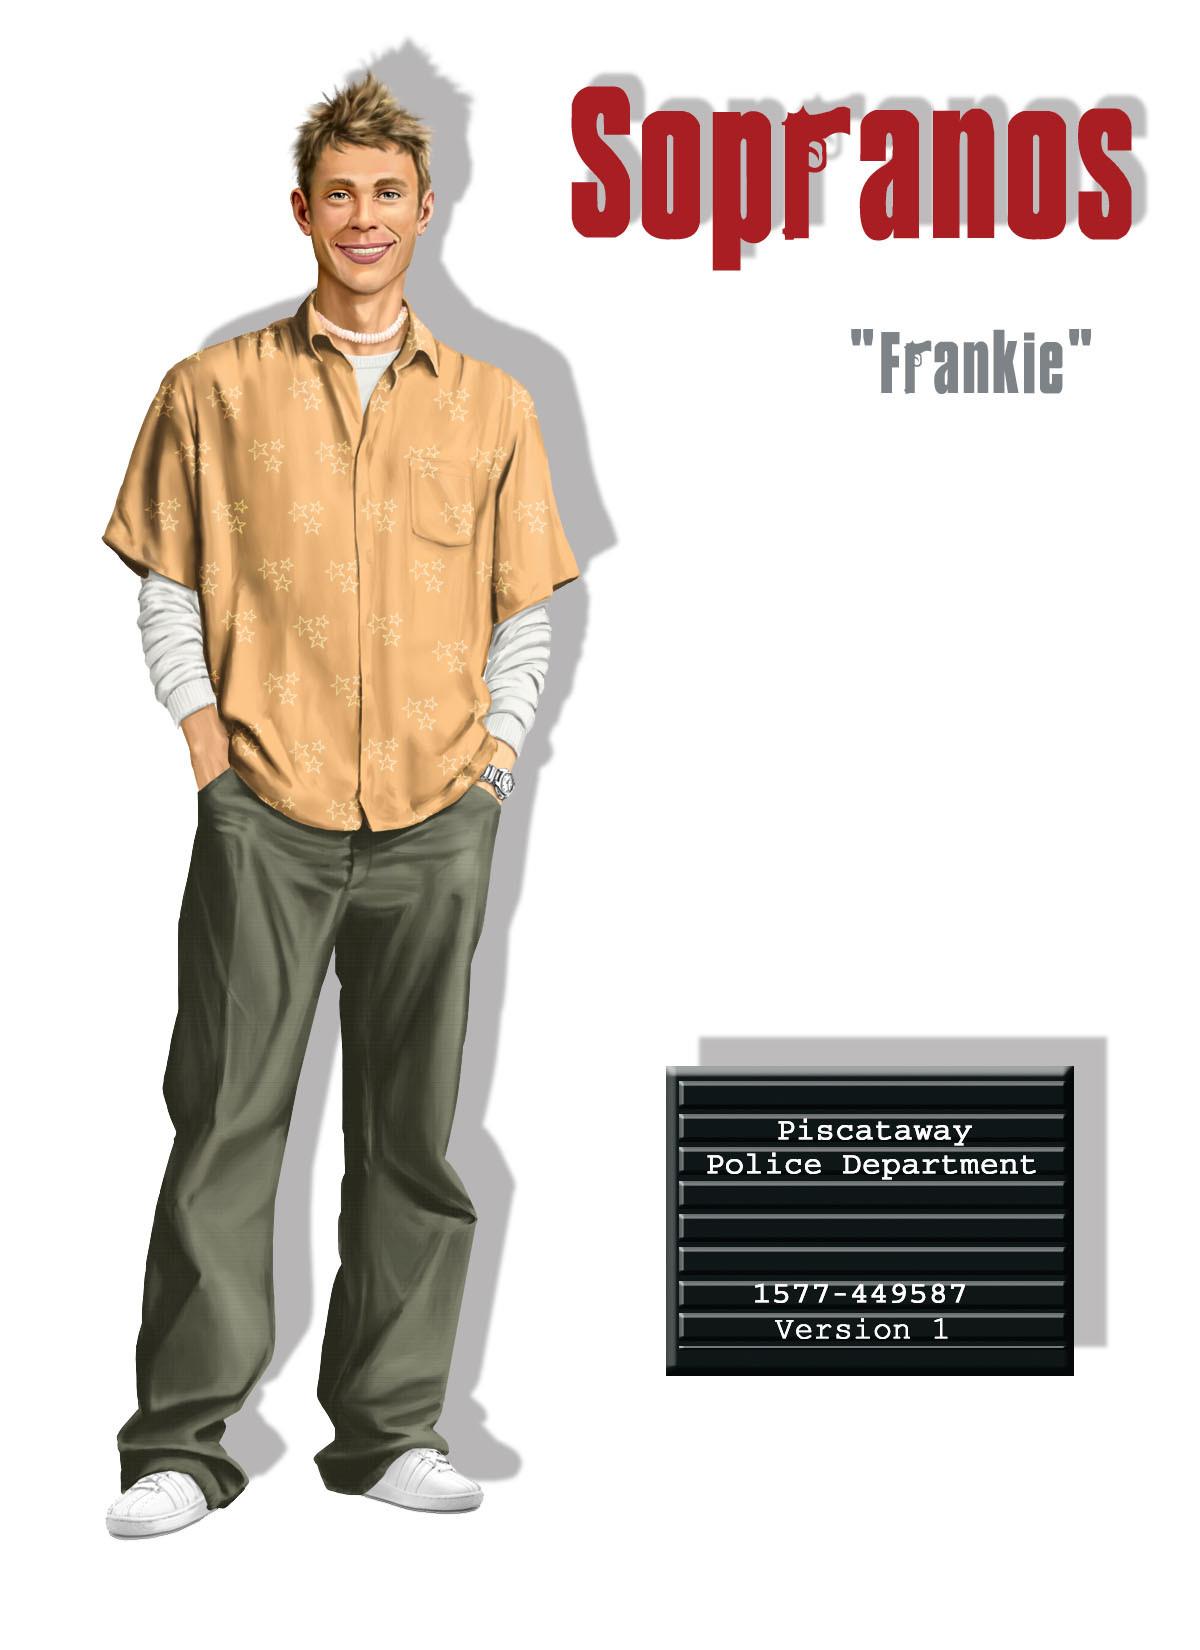 Jeff zugale sop npc frankie concept v1